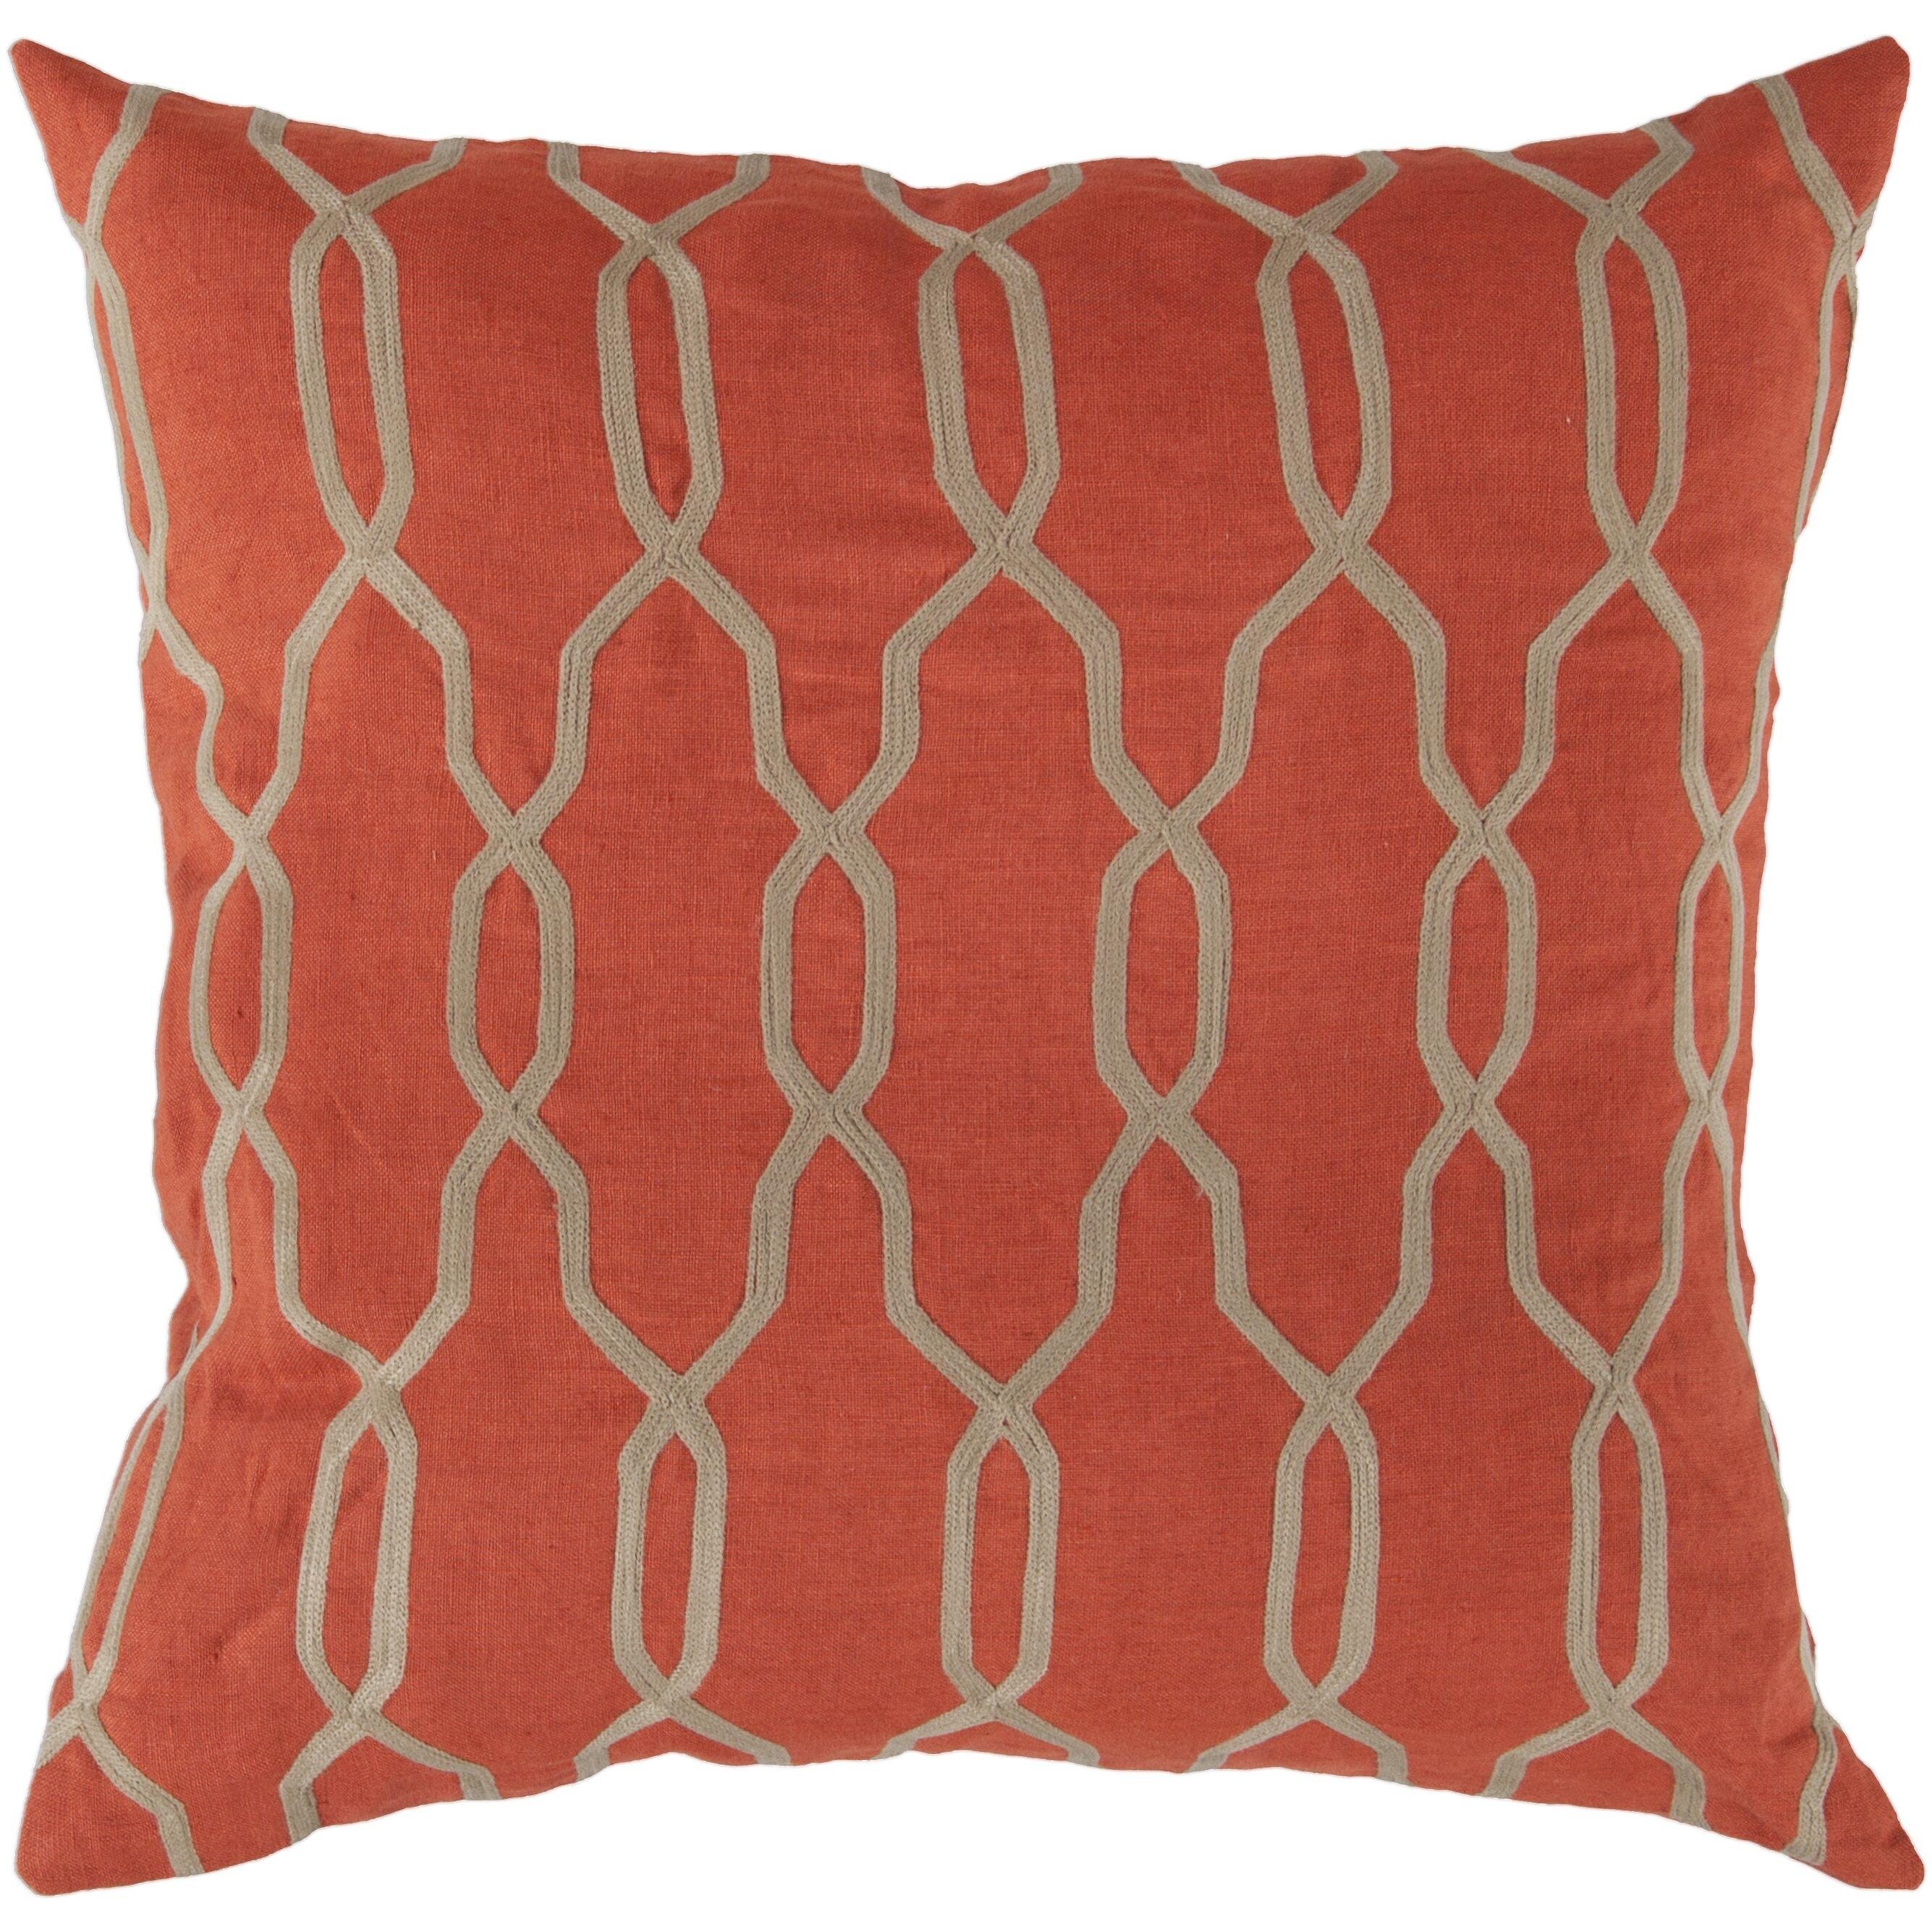 Red Barrel Studio Edgell Geometric Throw Pillow & Reviews Wayfair.ca